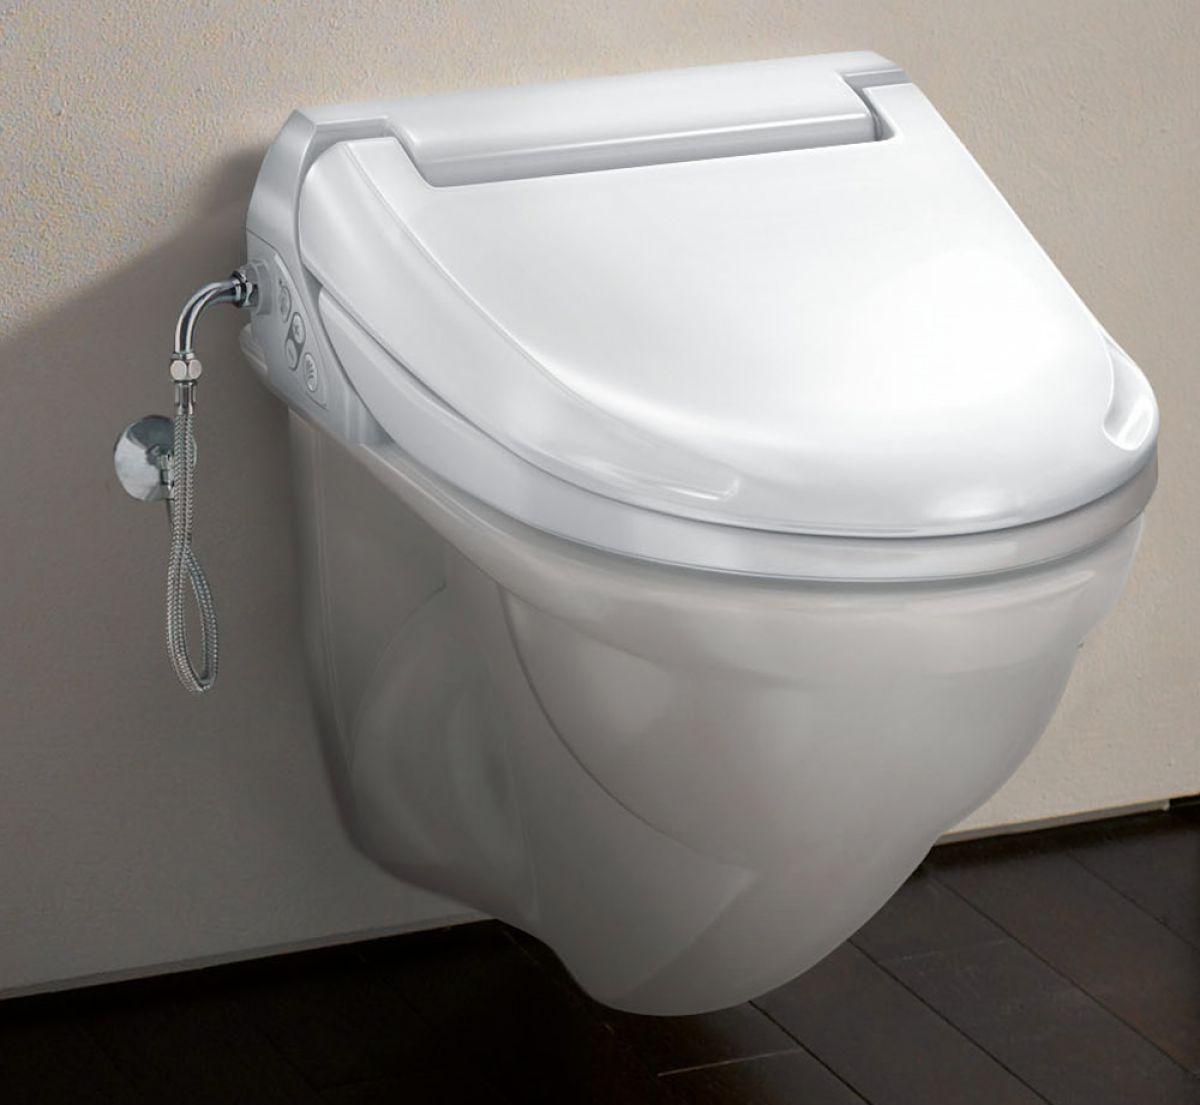 Крышка-биде AquaClean 4000 от Geberit на подвесном унитазе в интерьере. Вид А